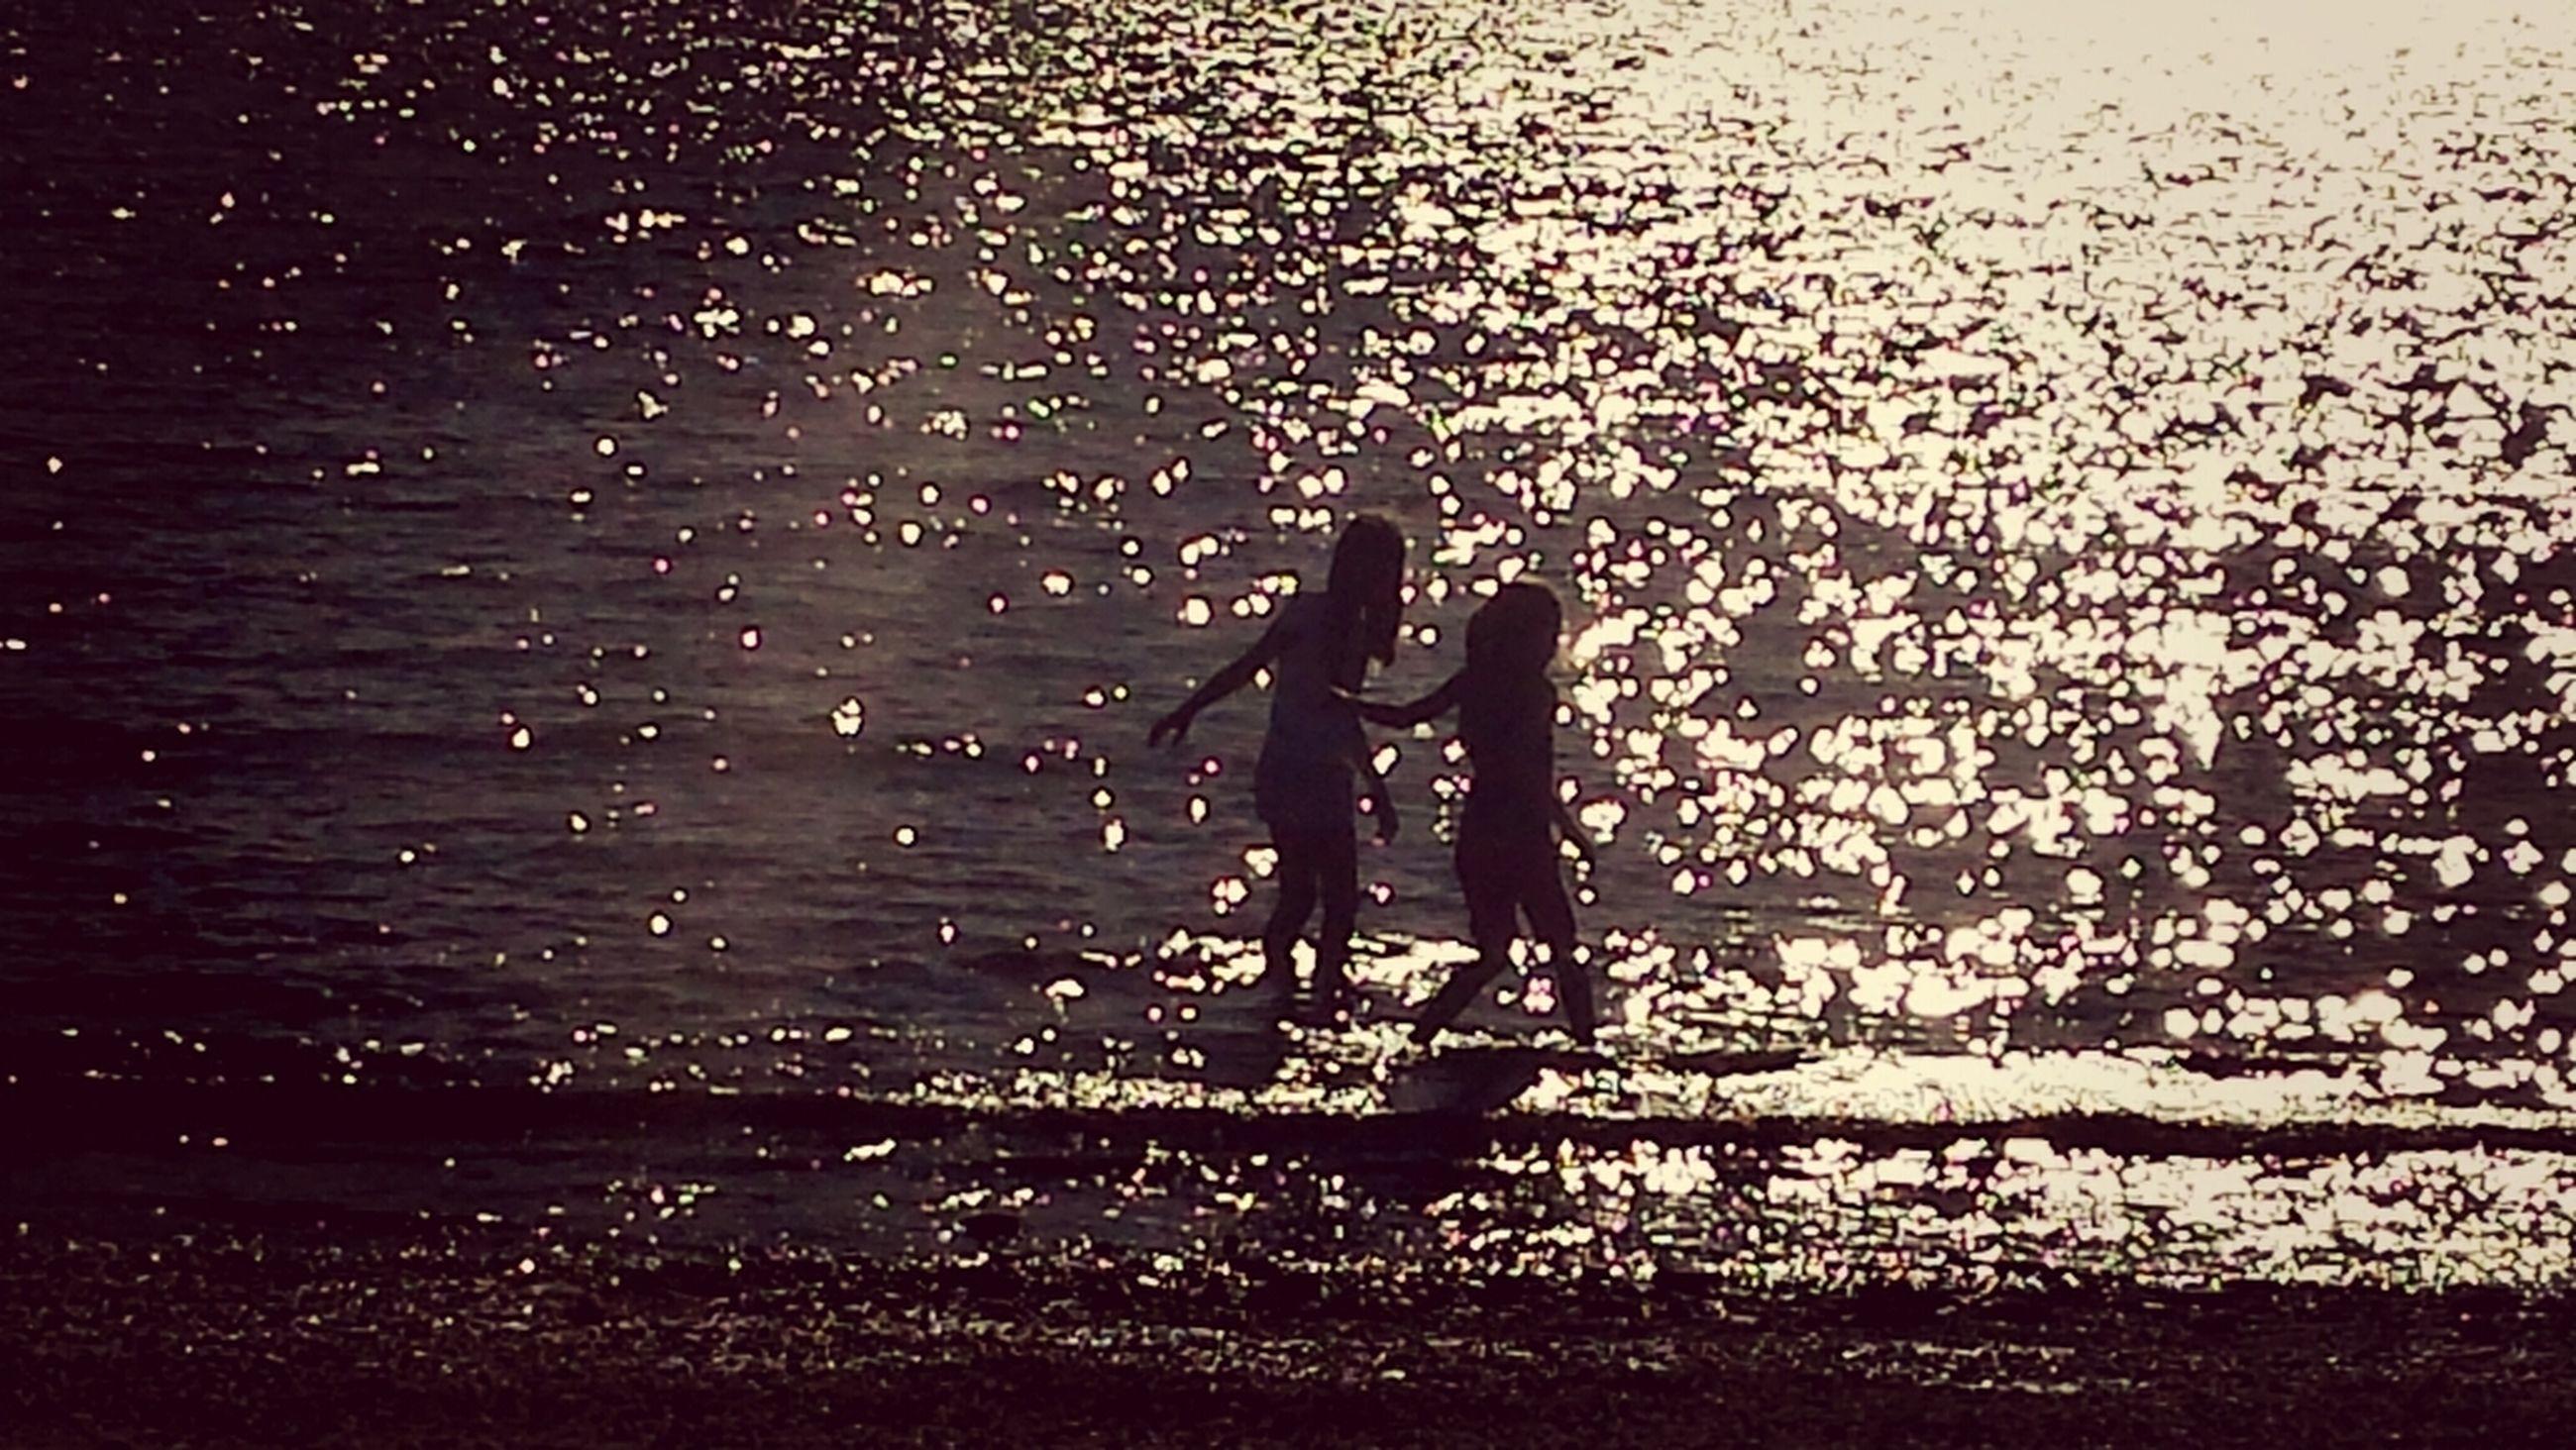 lifestyles, water, leisure activity, wet, rain, night, drop, season, standing, person, men, silhouette, weather, monsoon, full length, motion, indoors, illuminated